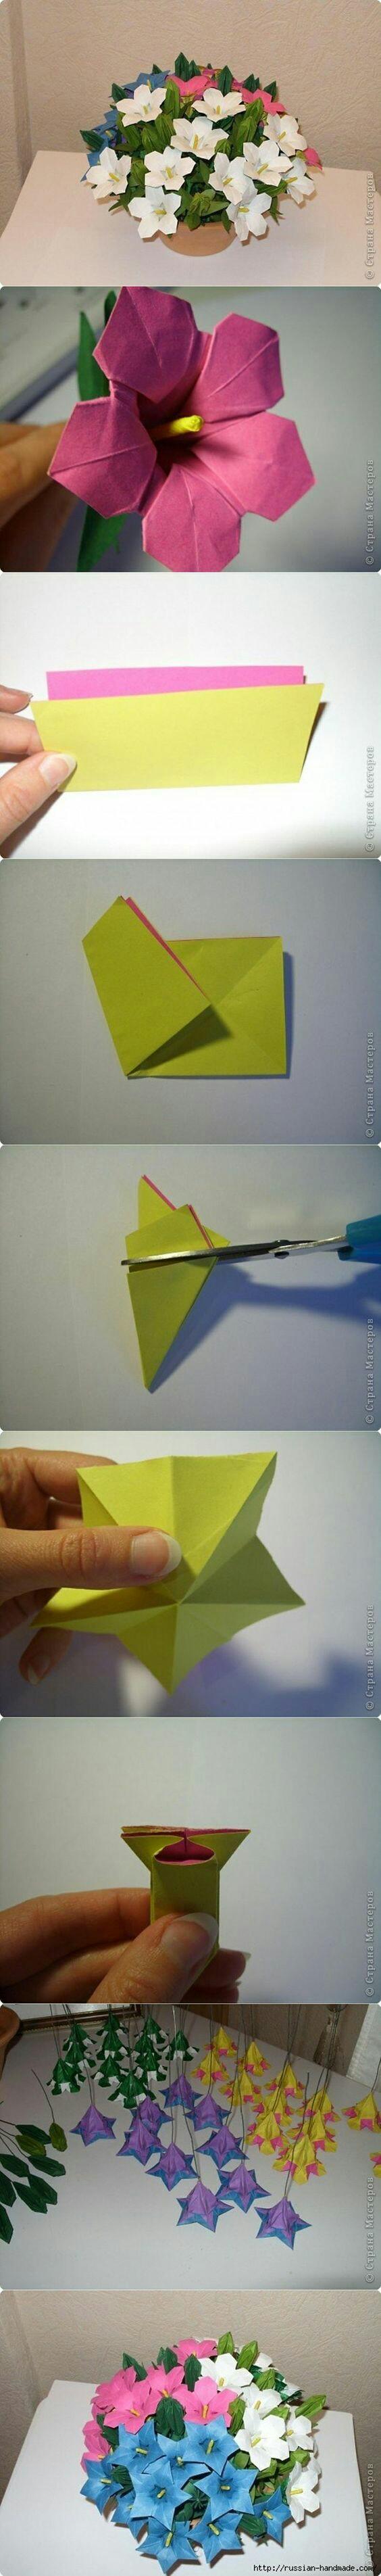 Diy paper flower origami diy pinterest diy paper origami how to make paper flowers using origami the art of paper folding fun paper diy on pumpernickel pixie mightylinksfo